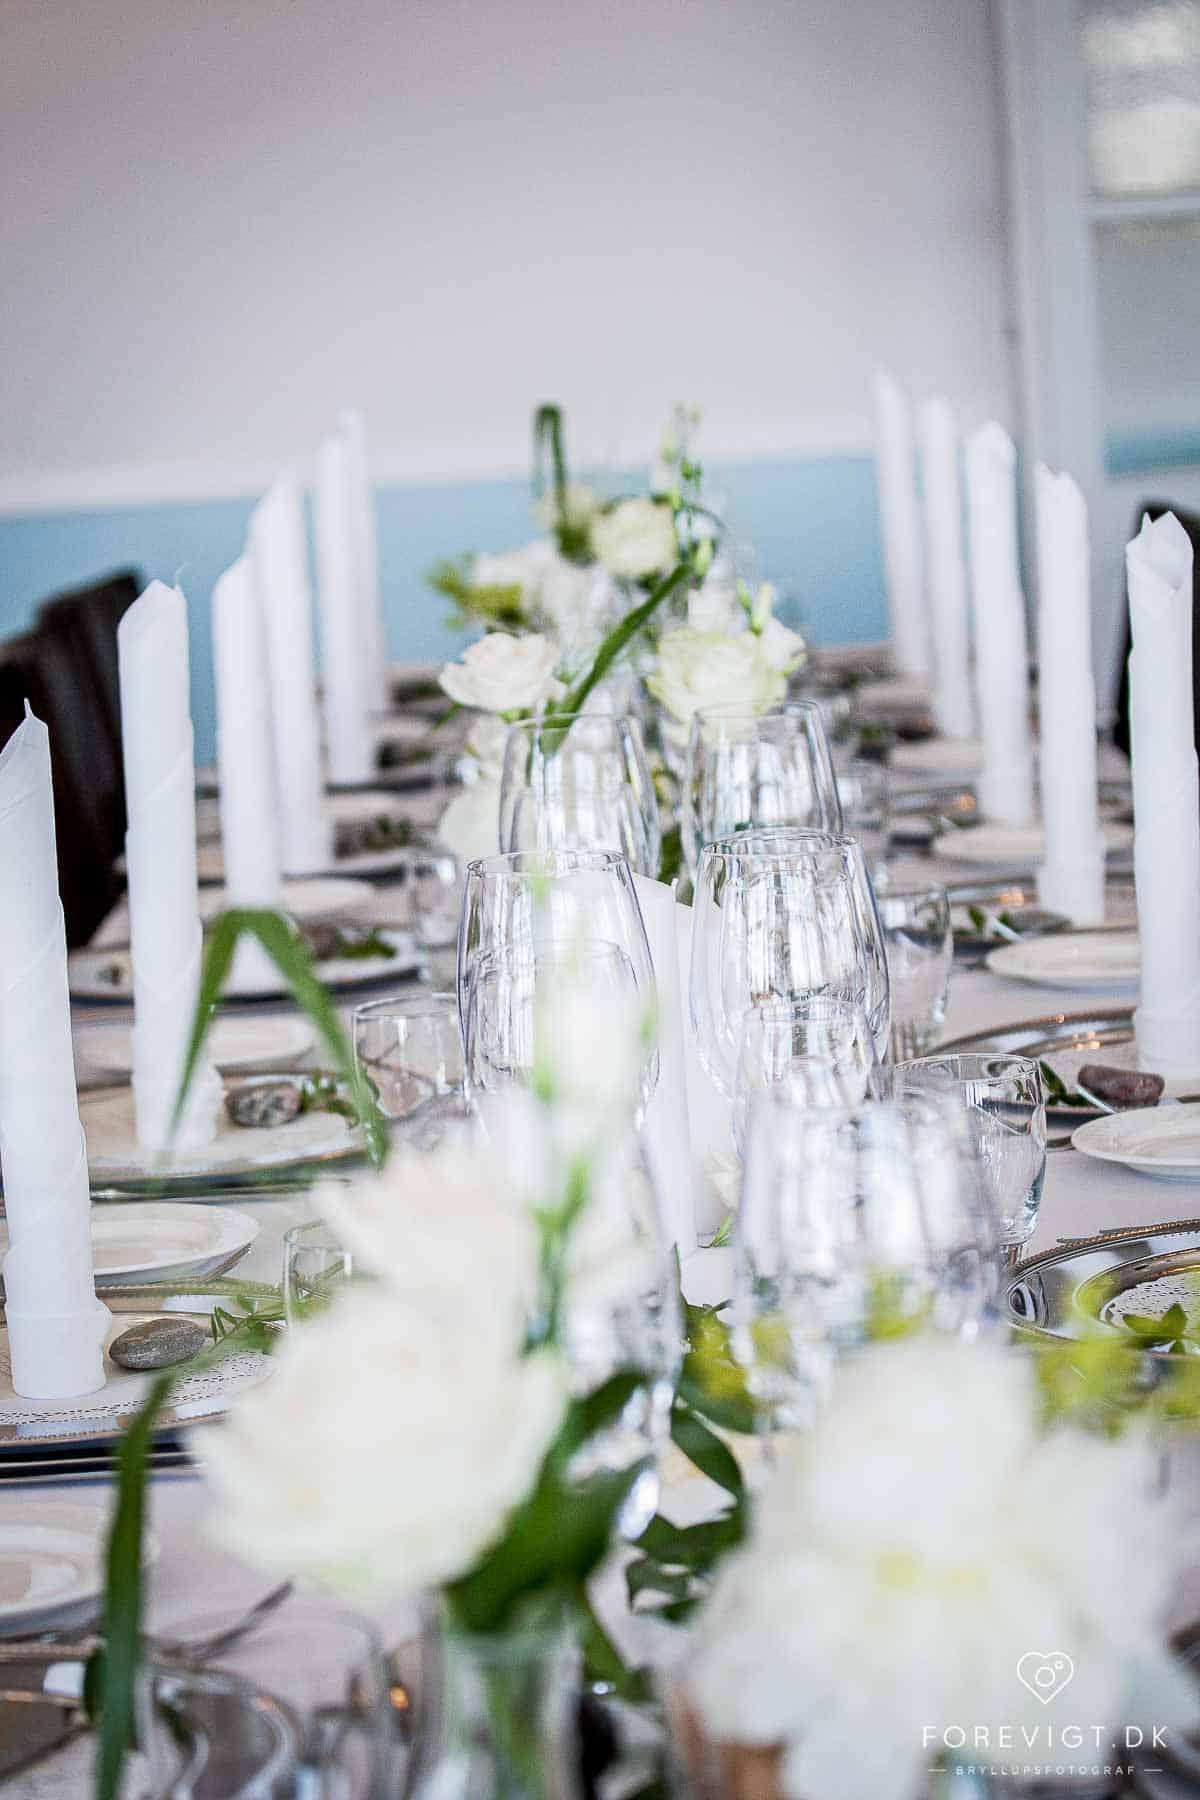 Restaurant Gisseløre - Menu til bryllup